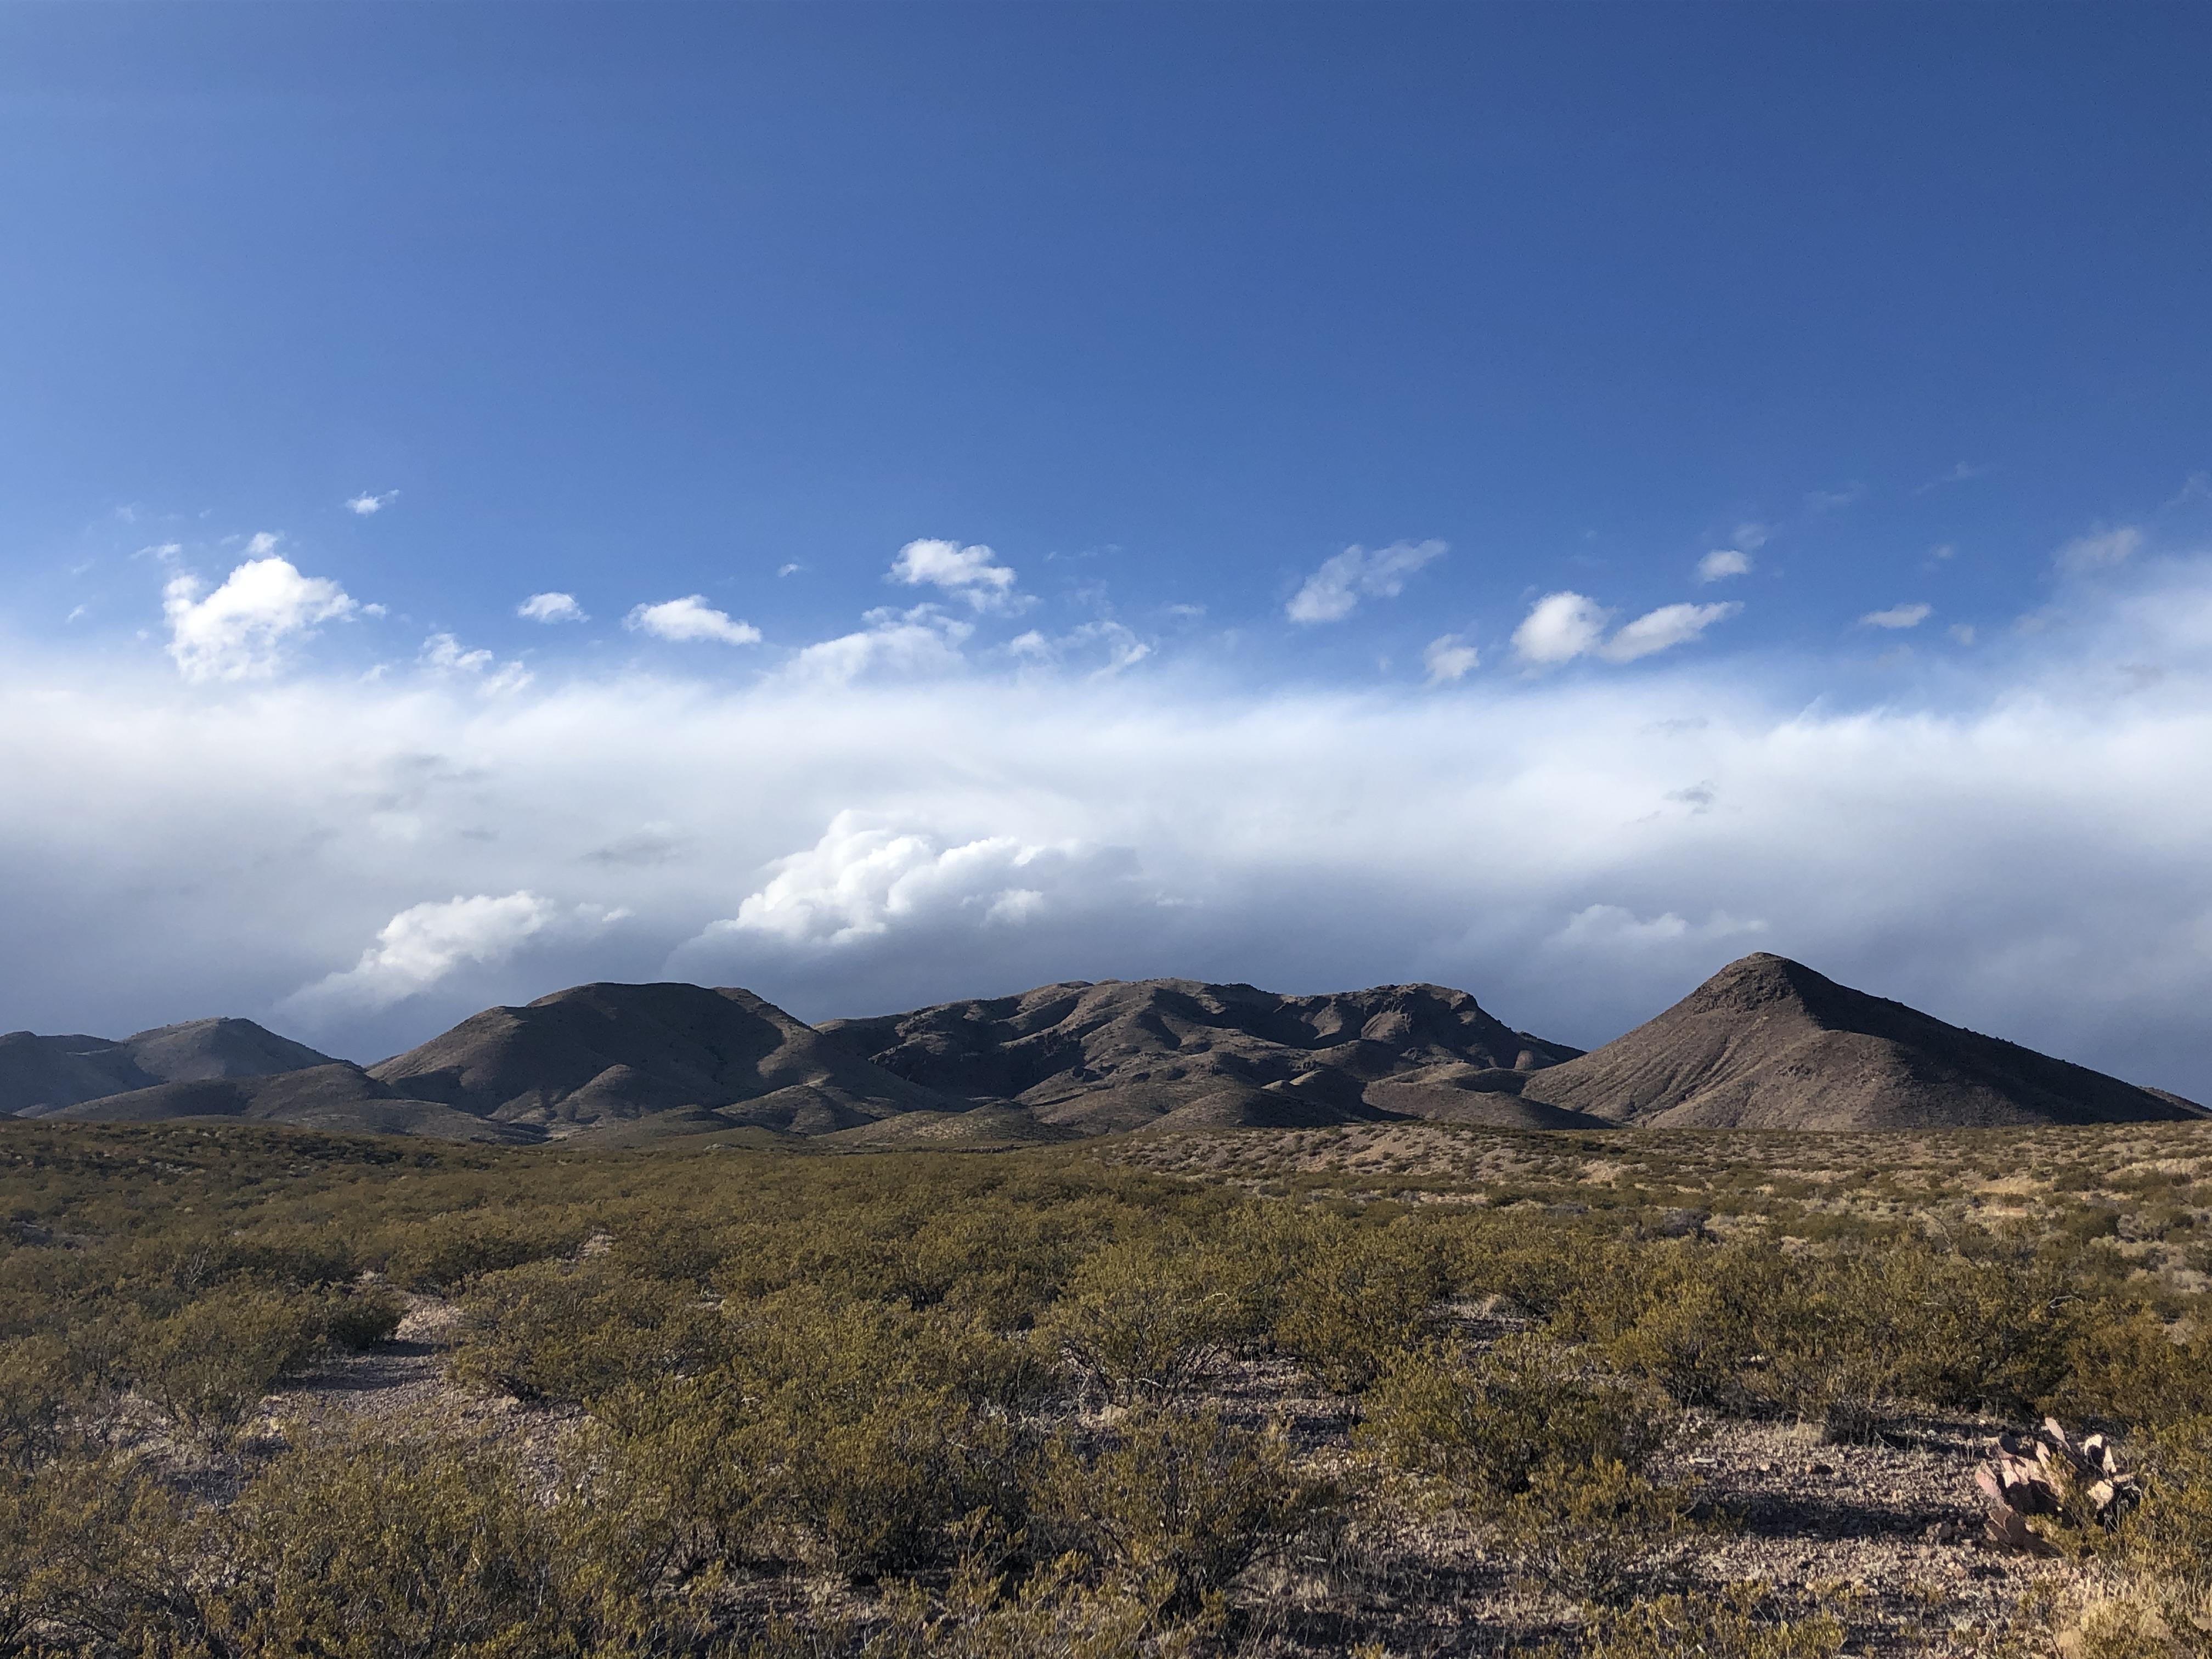 Chupadera Mountains (San Antonio, New Mexico)